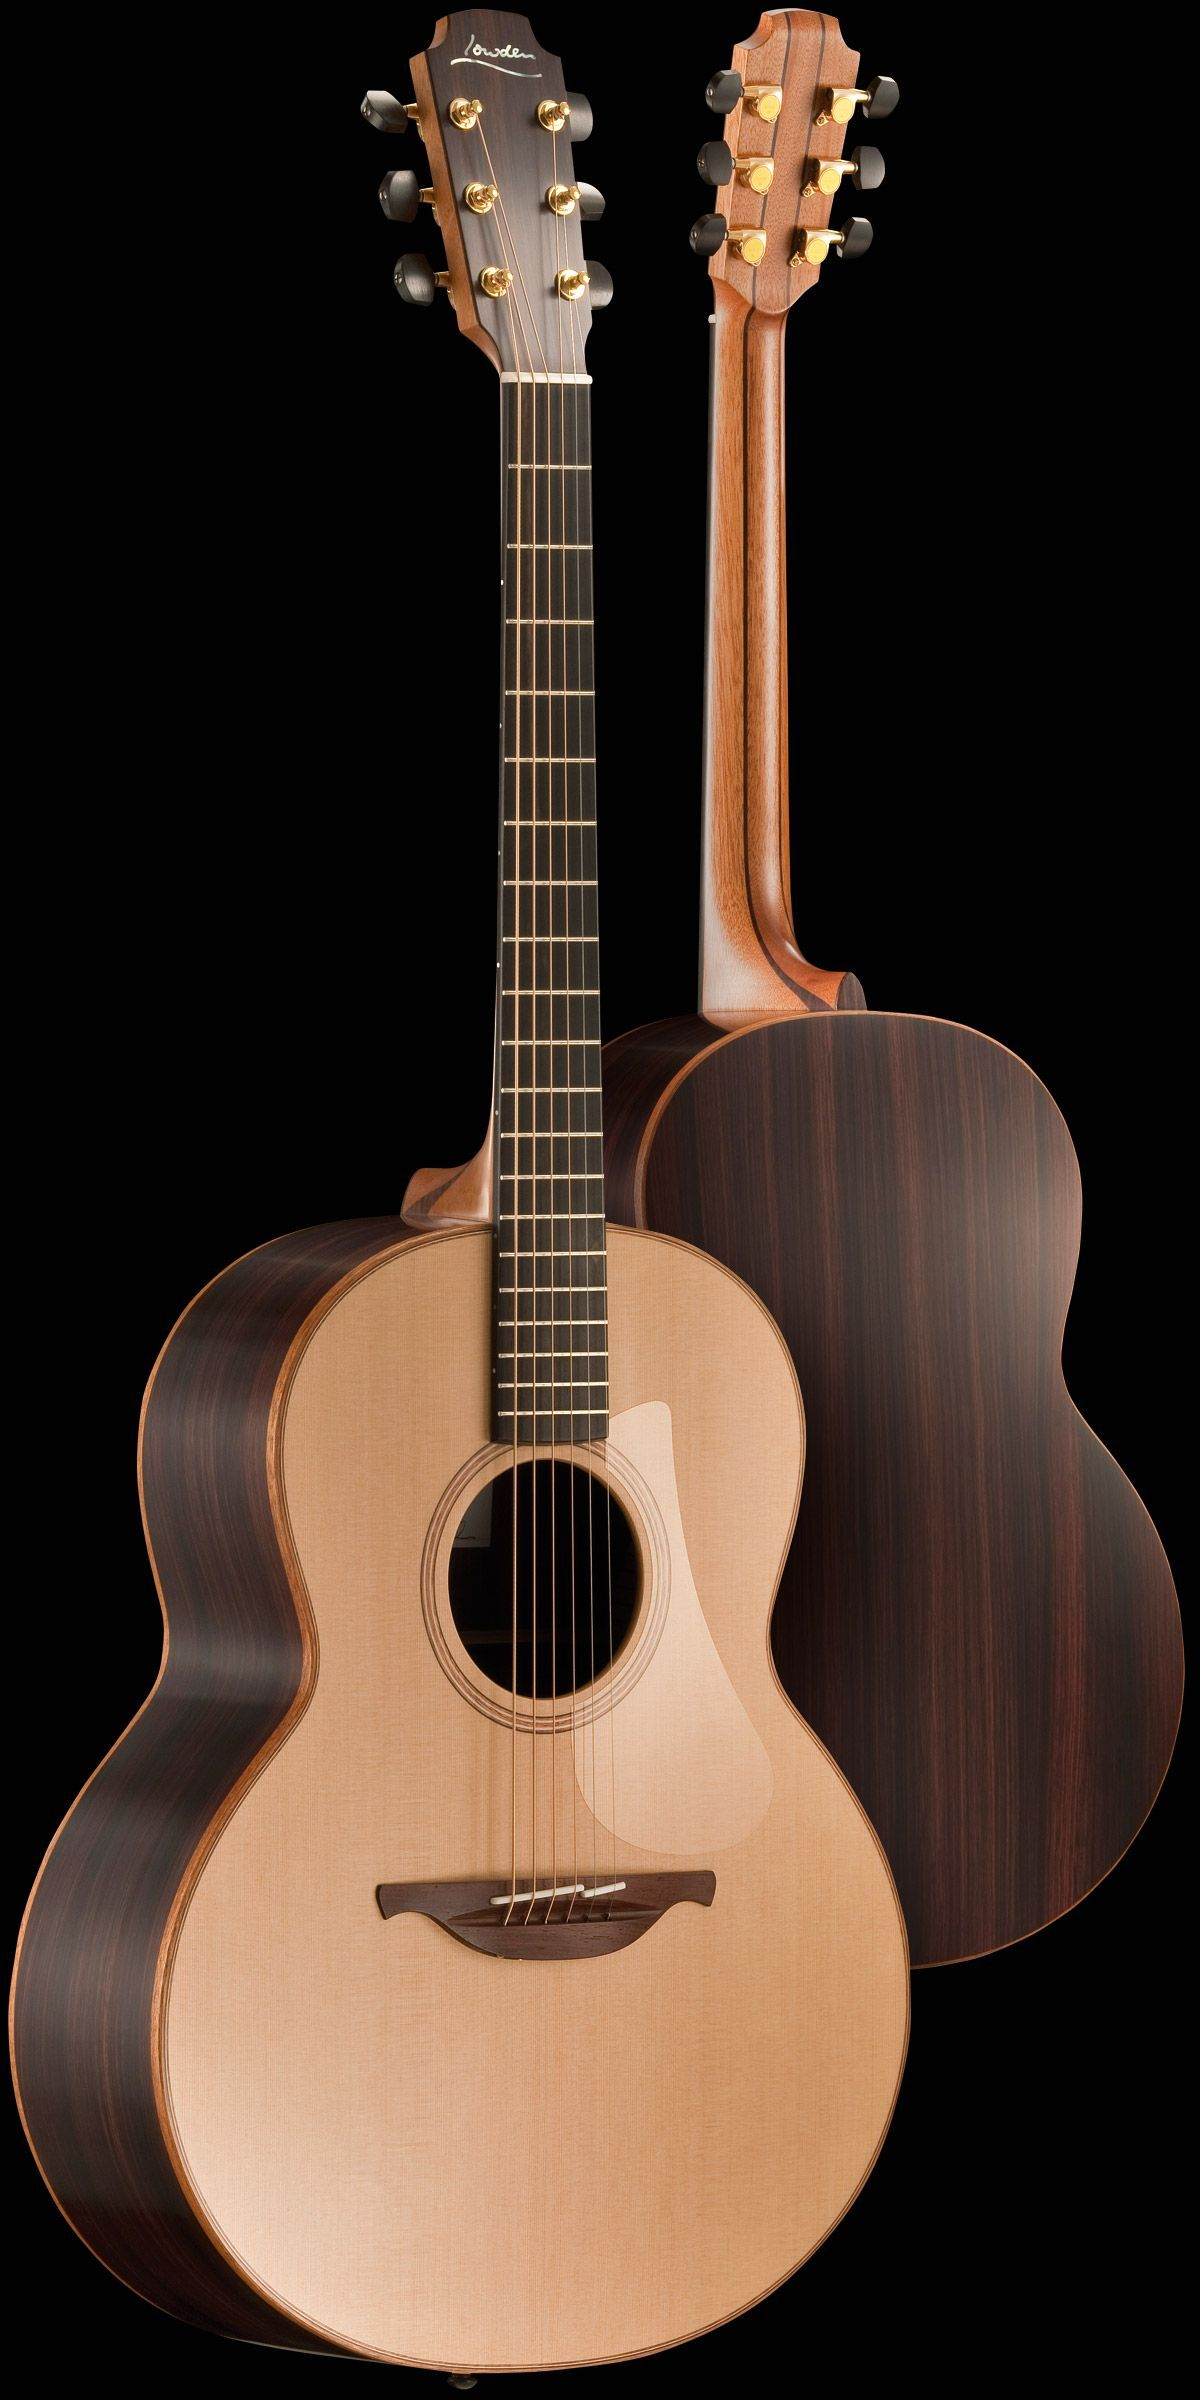 Original Series Lowden Guitars Handmade And Hand Built Acoustic Guitar Range From Downpatrick Ireland Acous Best Acoustic Guitar Acoustic Guitar Acoustic